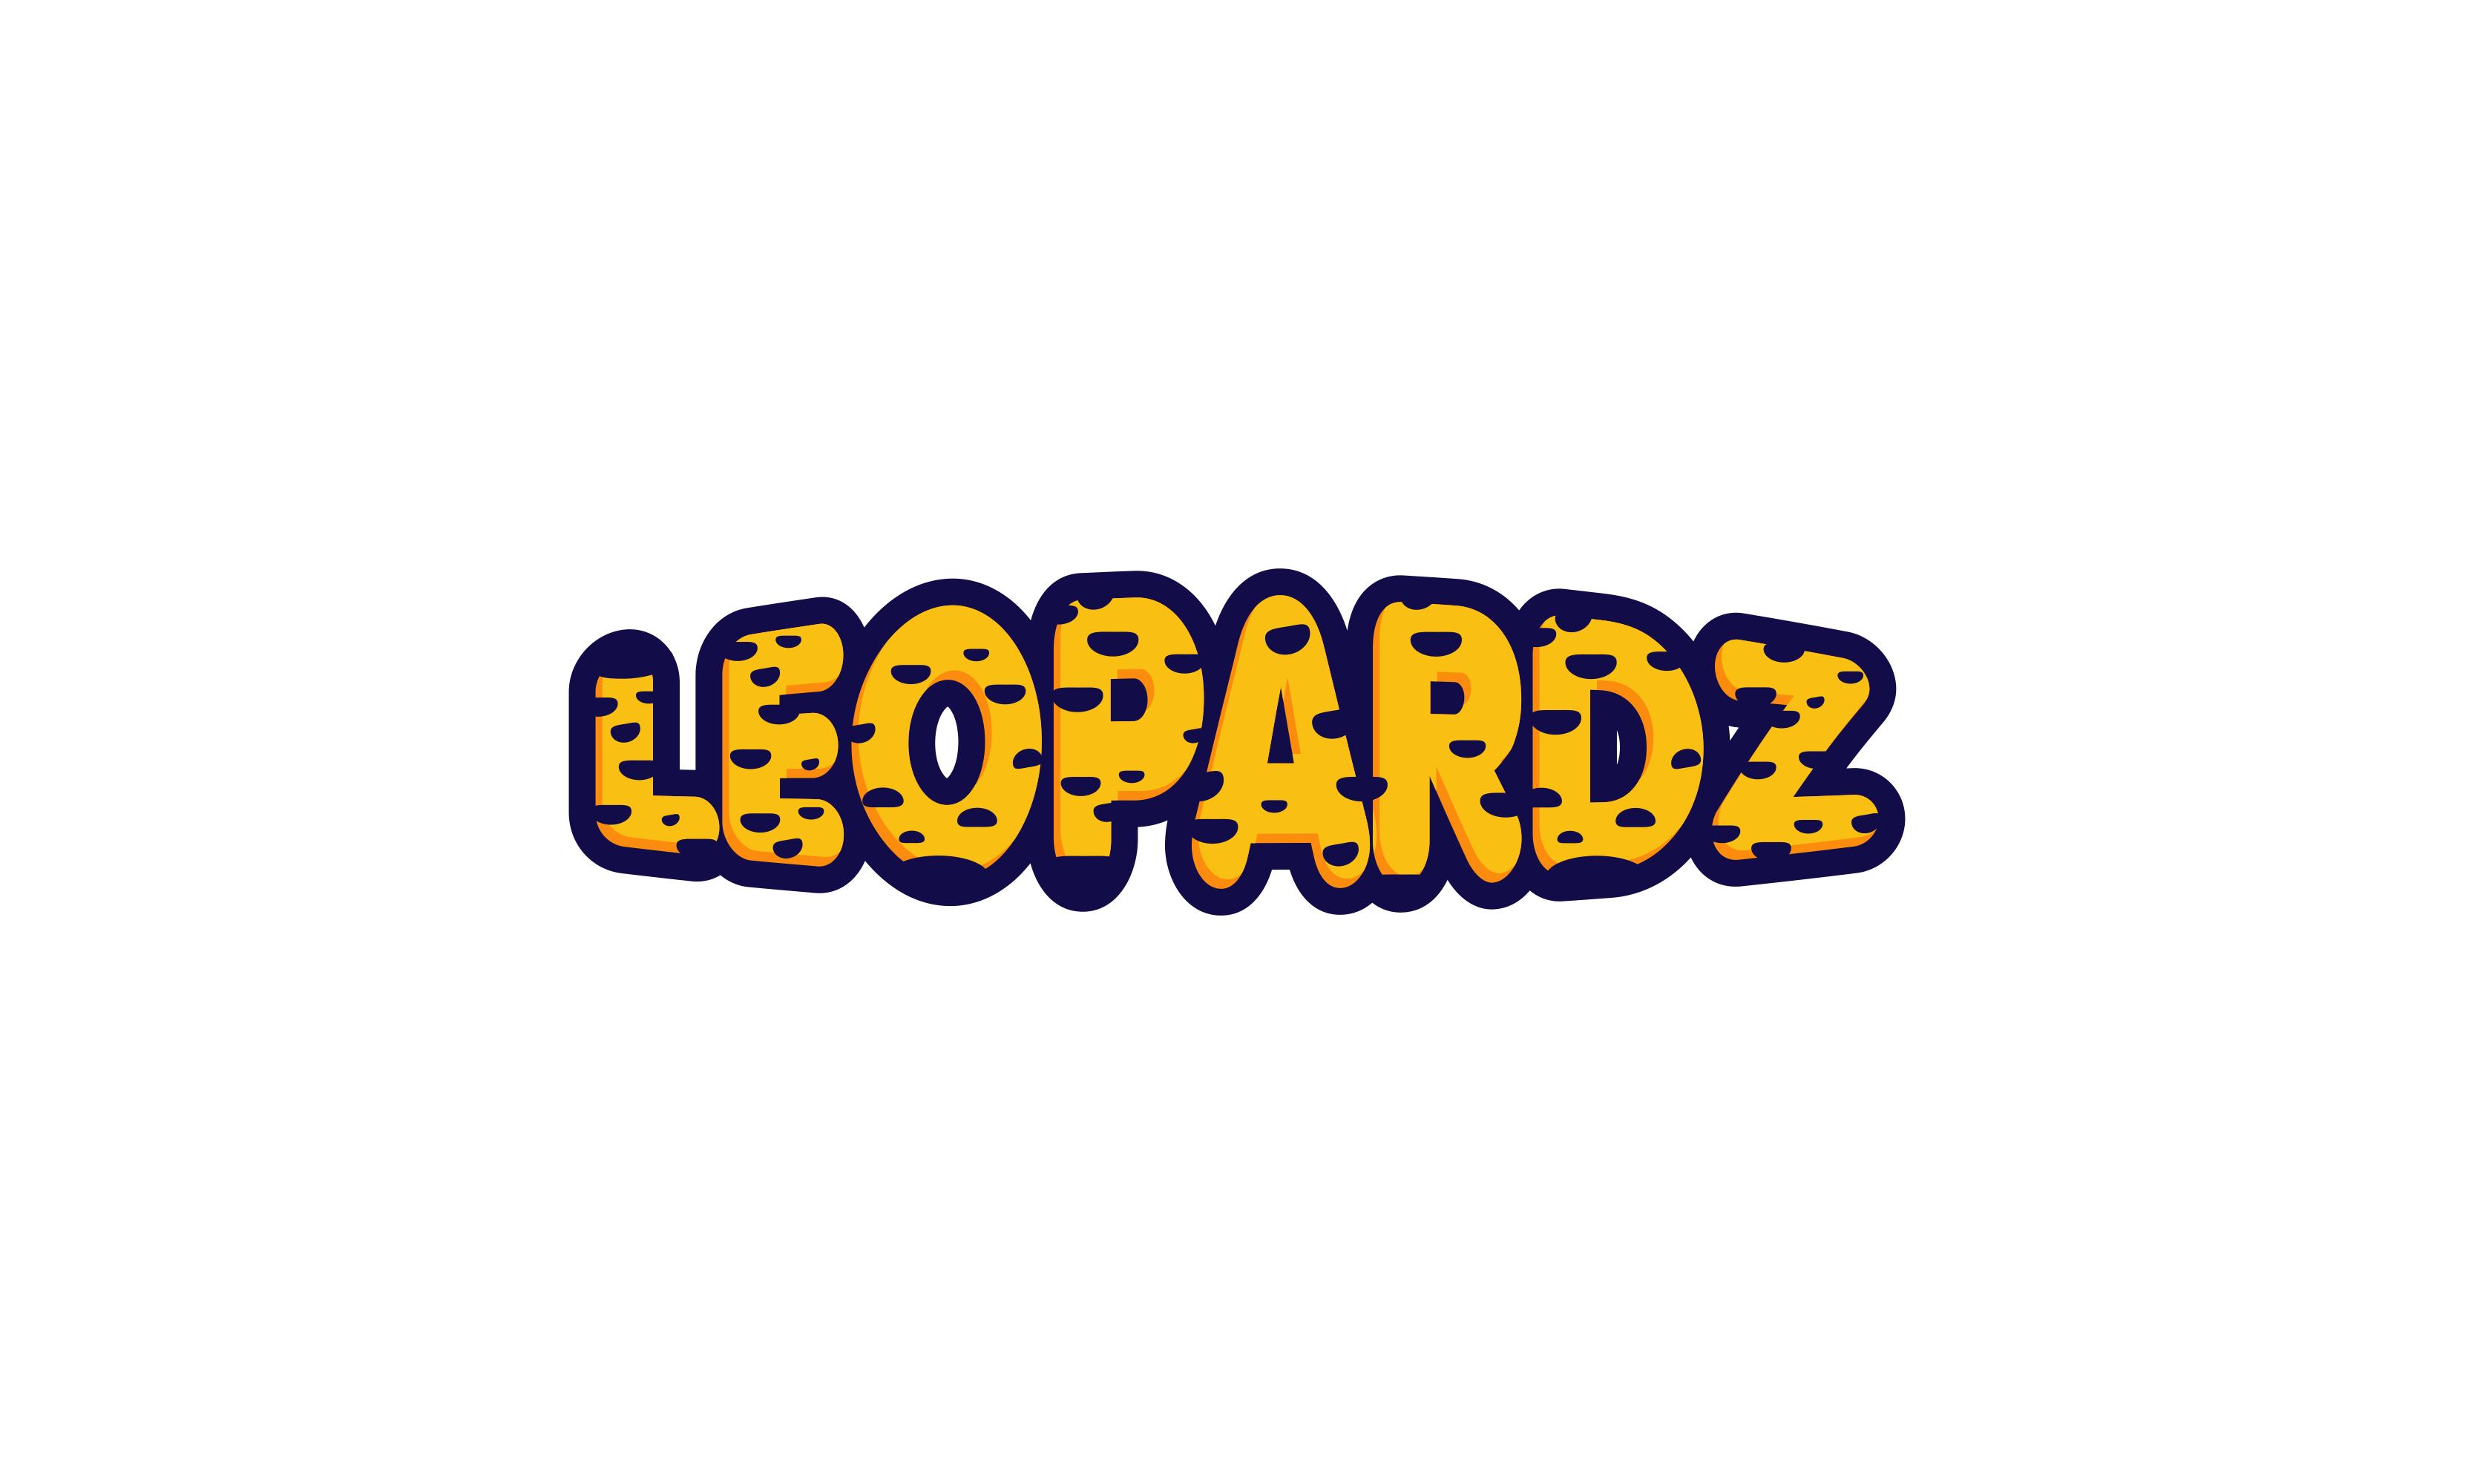 Leopardz